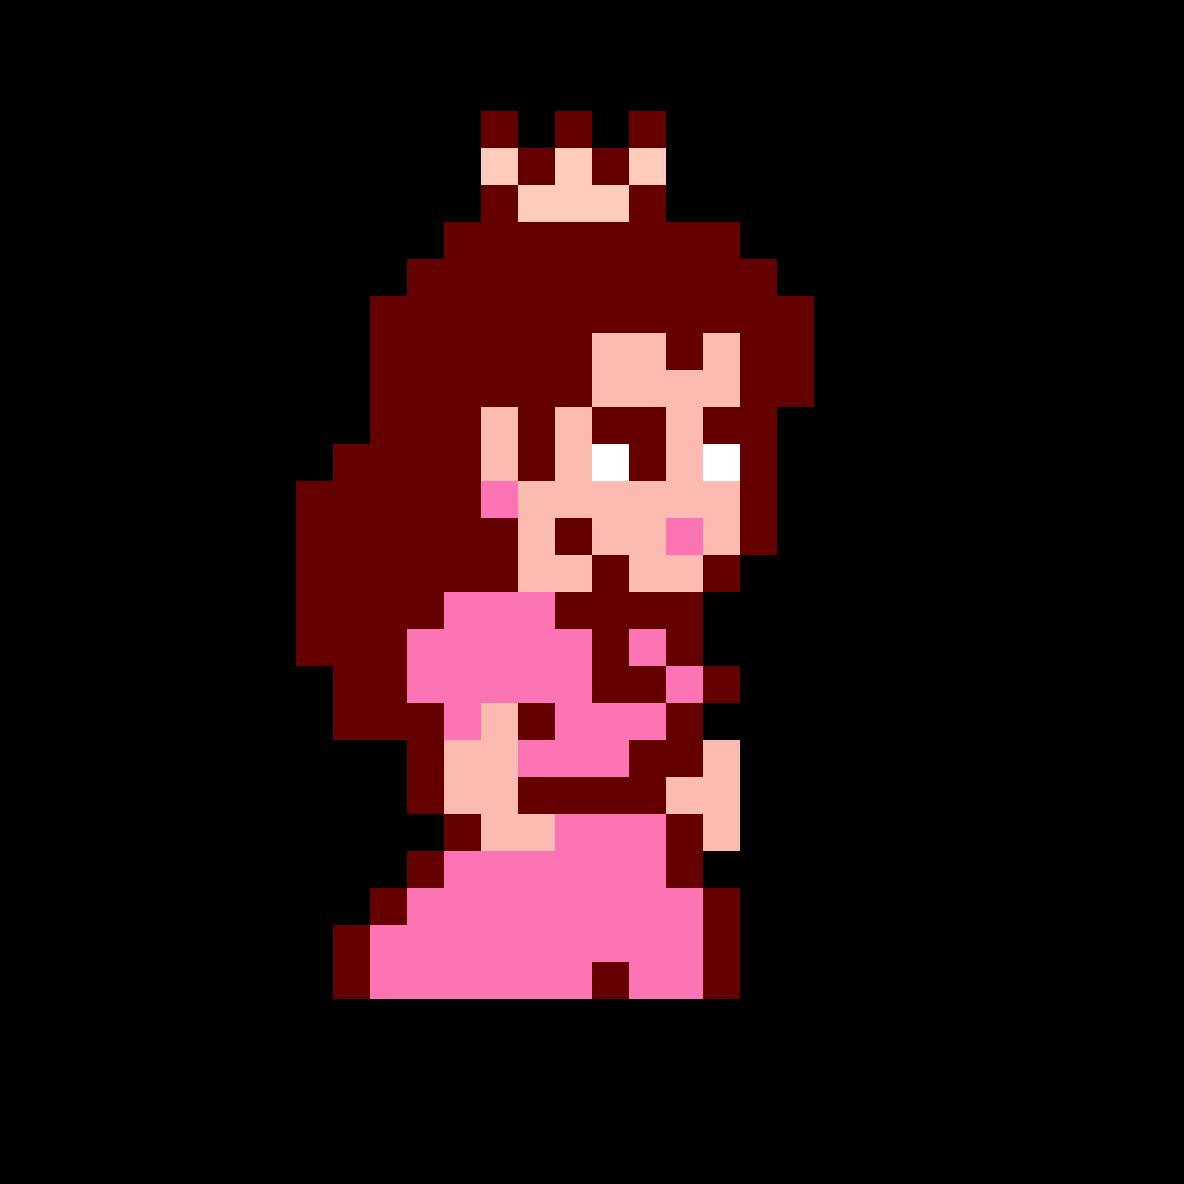 Pixilart Princess Peach Super Mario Bros 2 By Victoria Rose